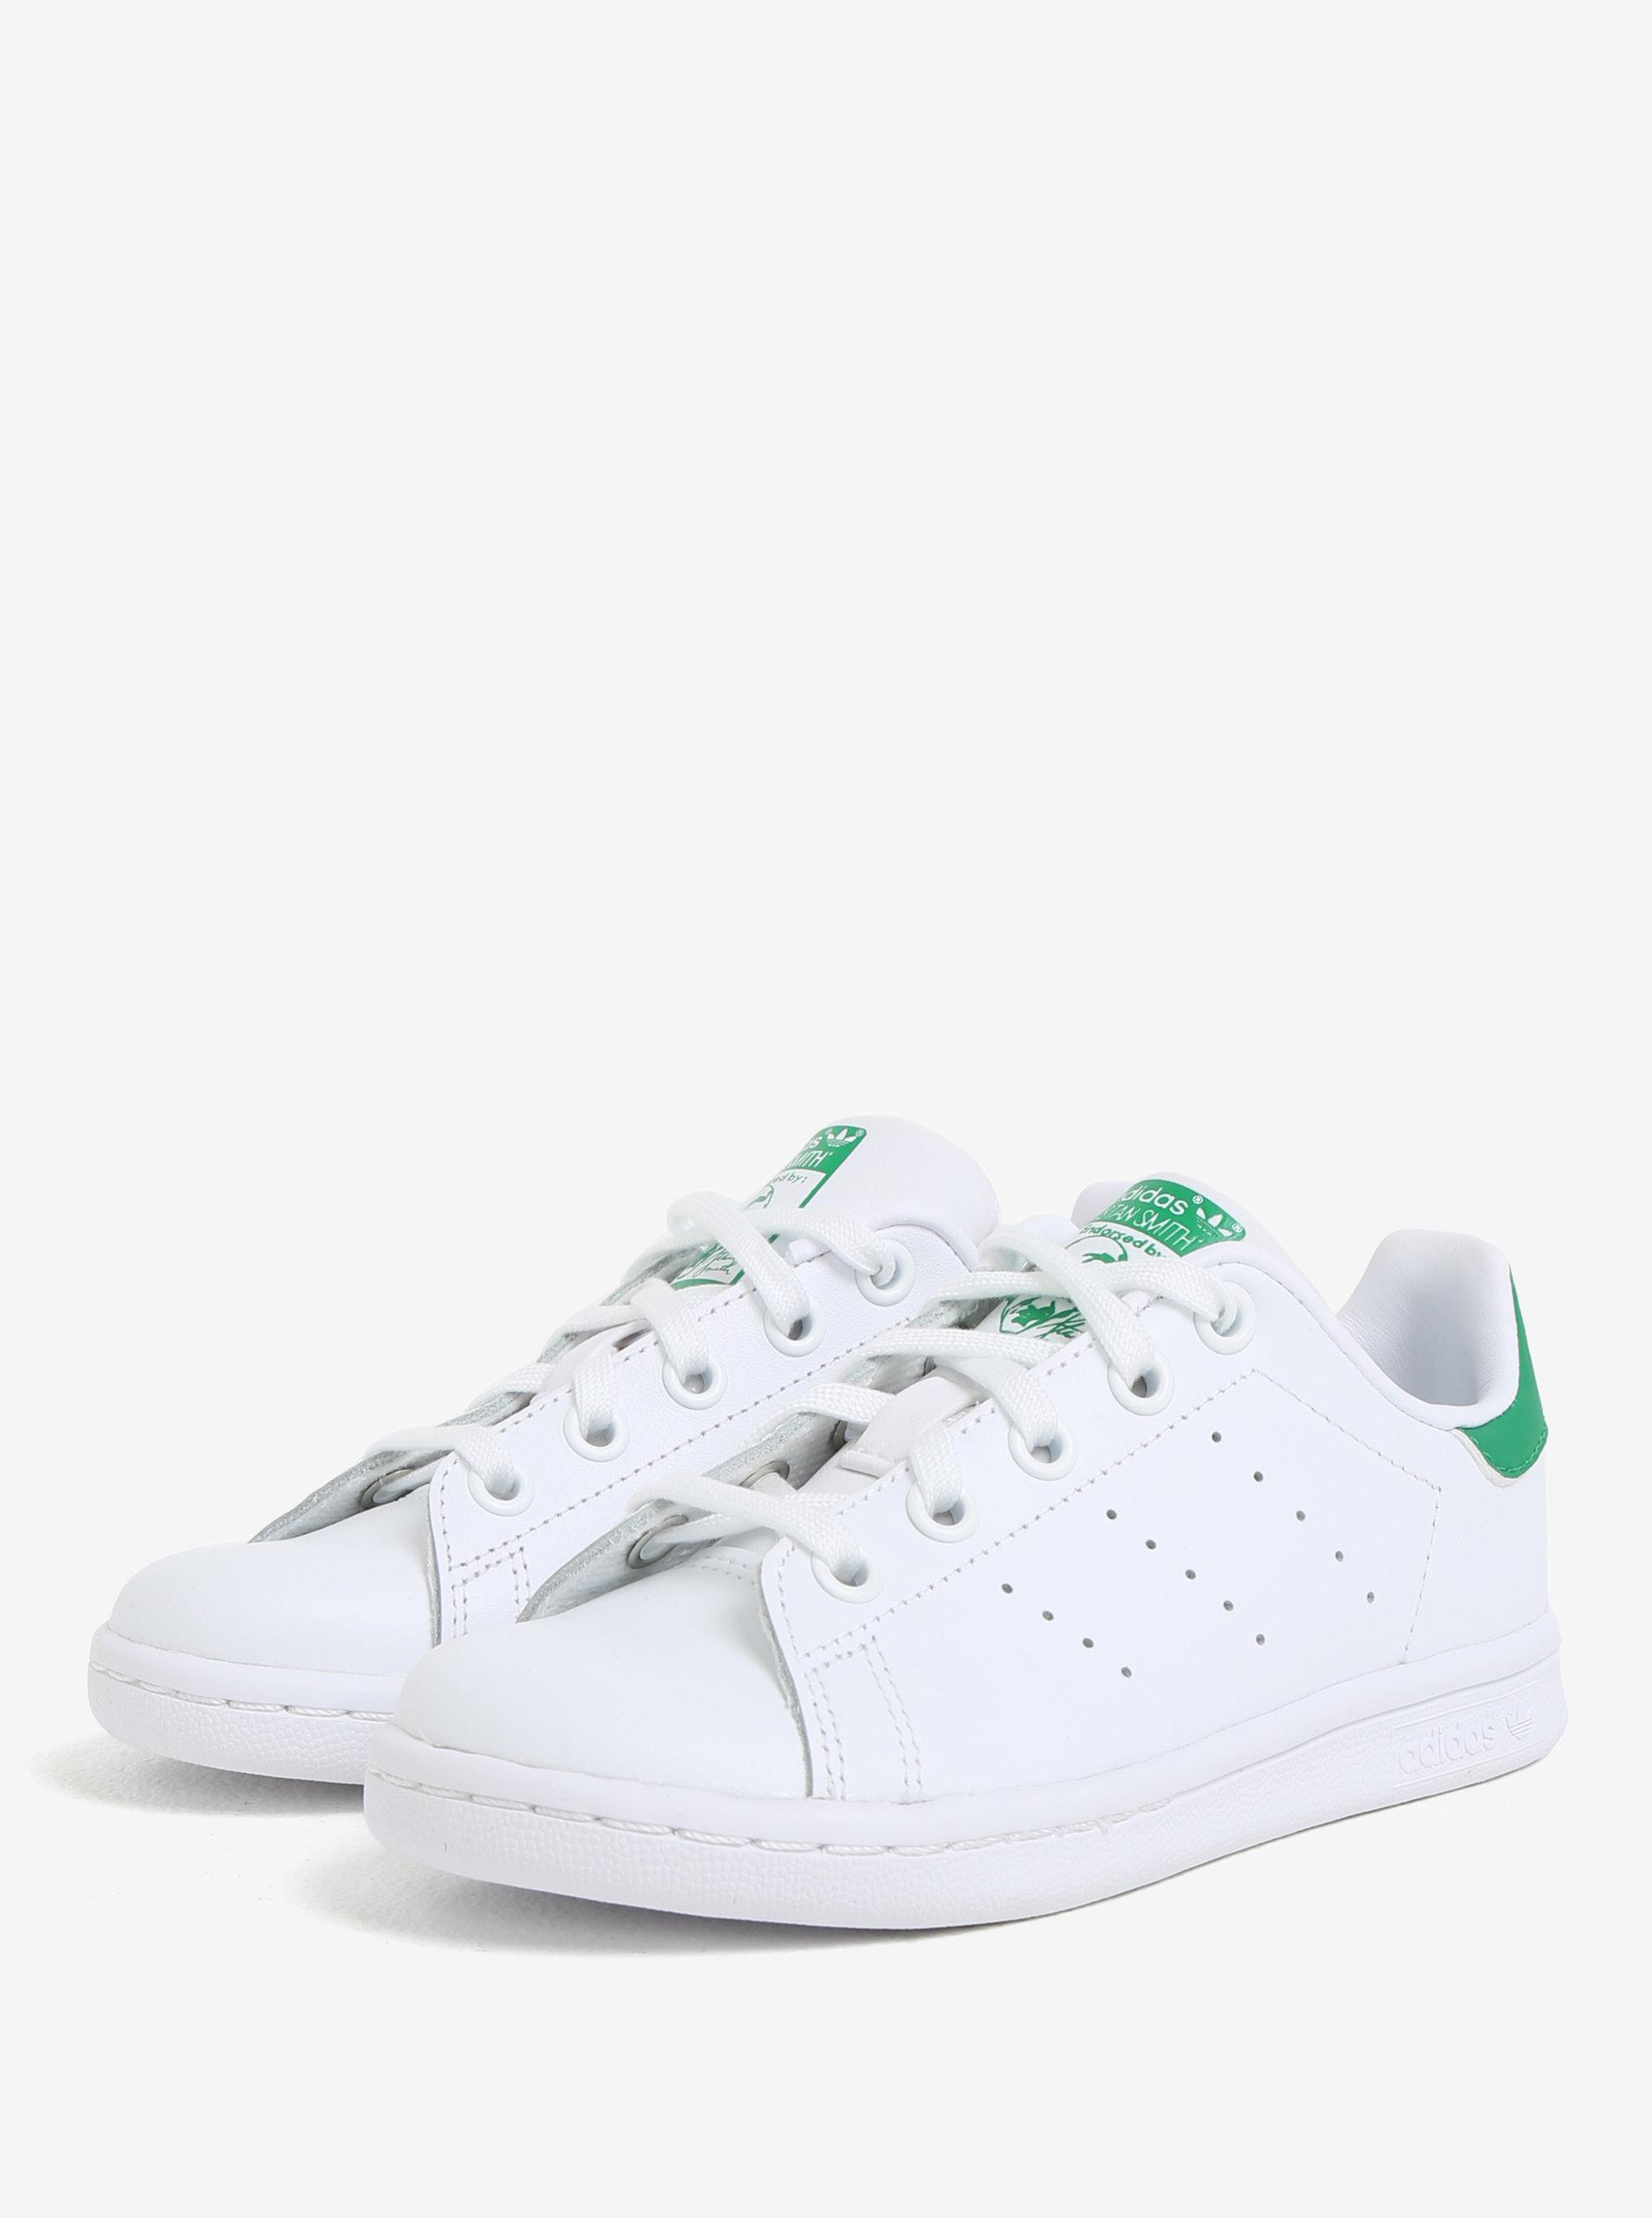 142cc48c709 Zeleno-bílé dětské kožené tenisky adidas Originals Stan Smith C ...